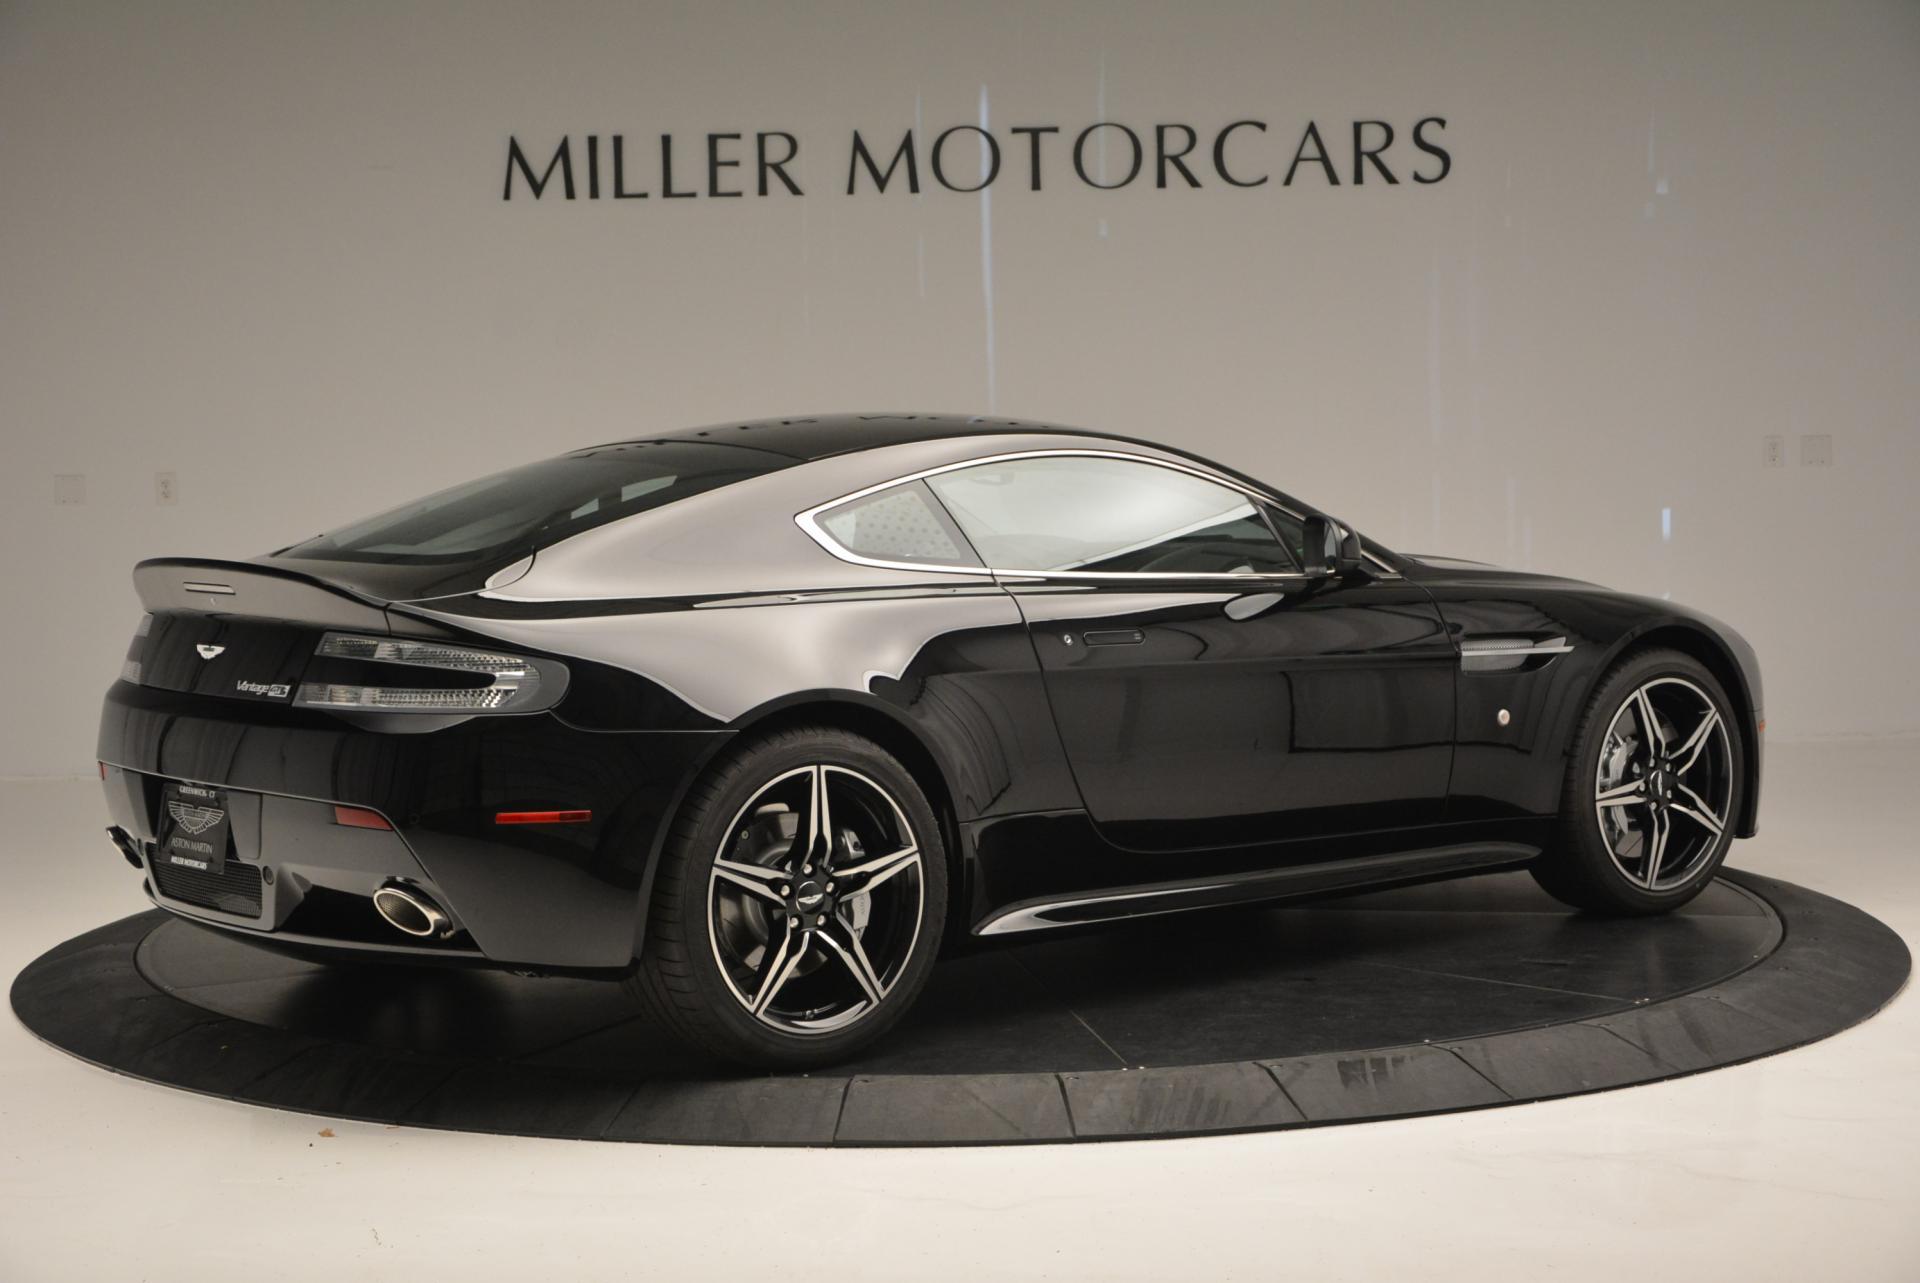 New 2016 Aston Martin V8 Vantage GTS S For Sale In Westport, CT 526_p7